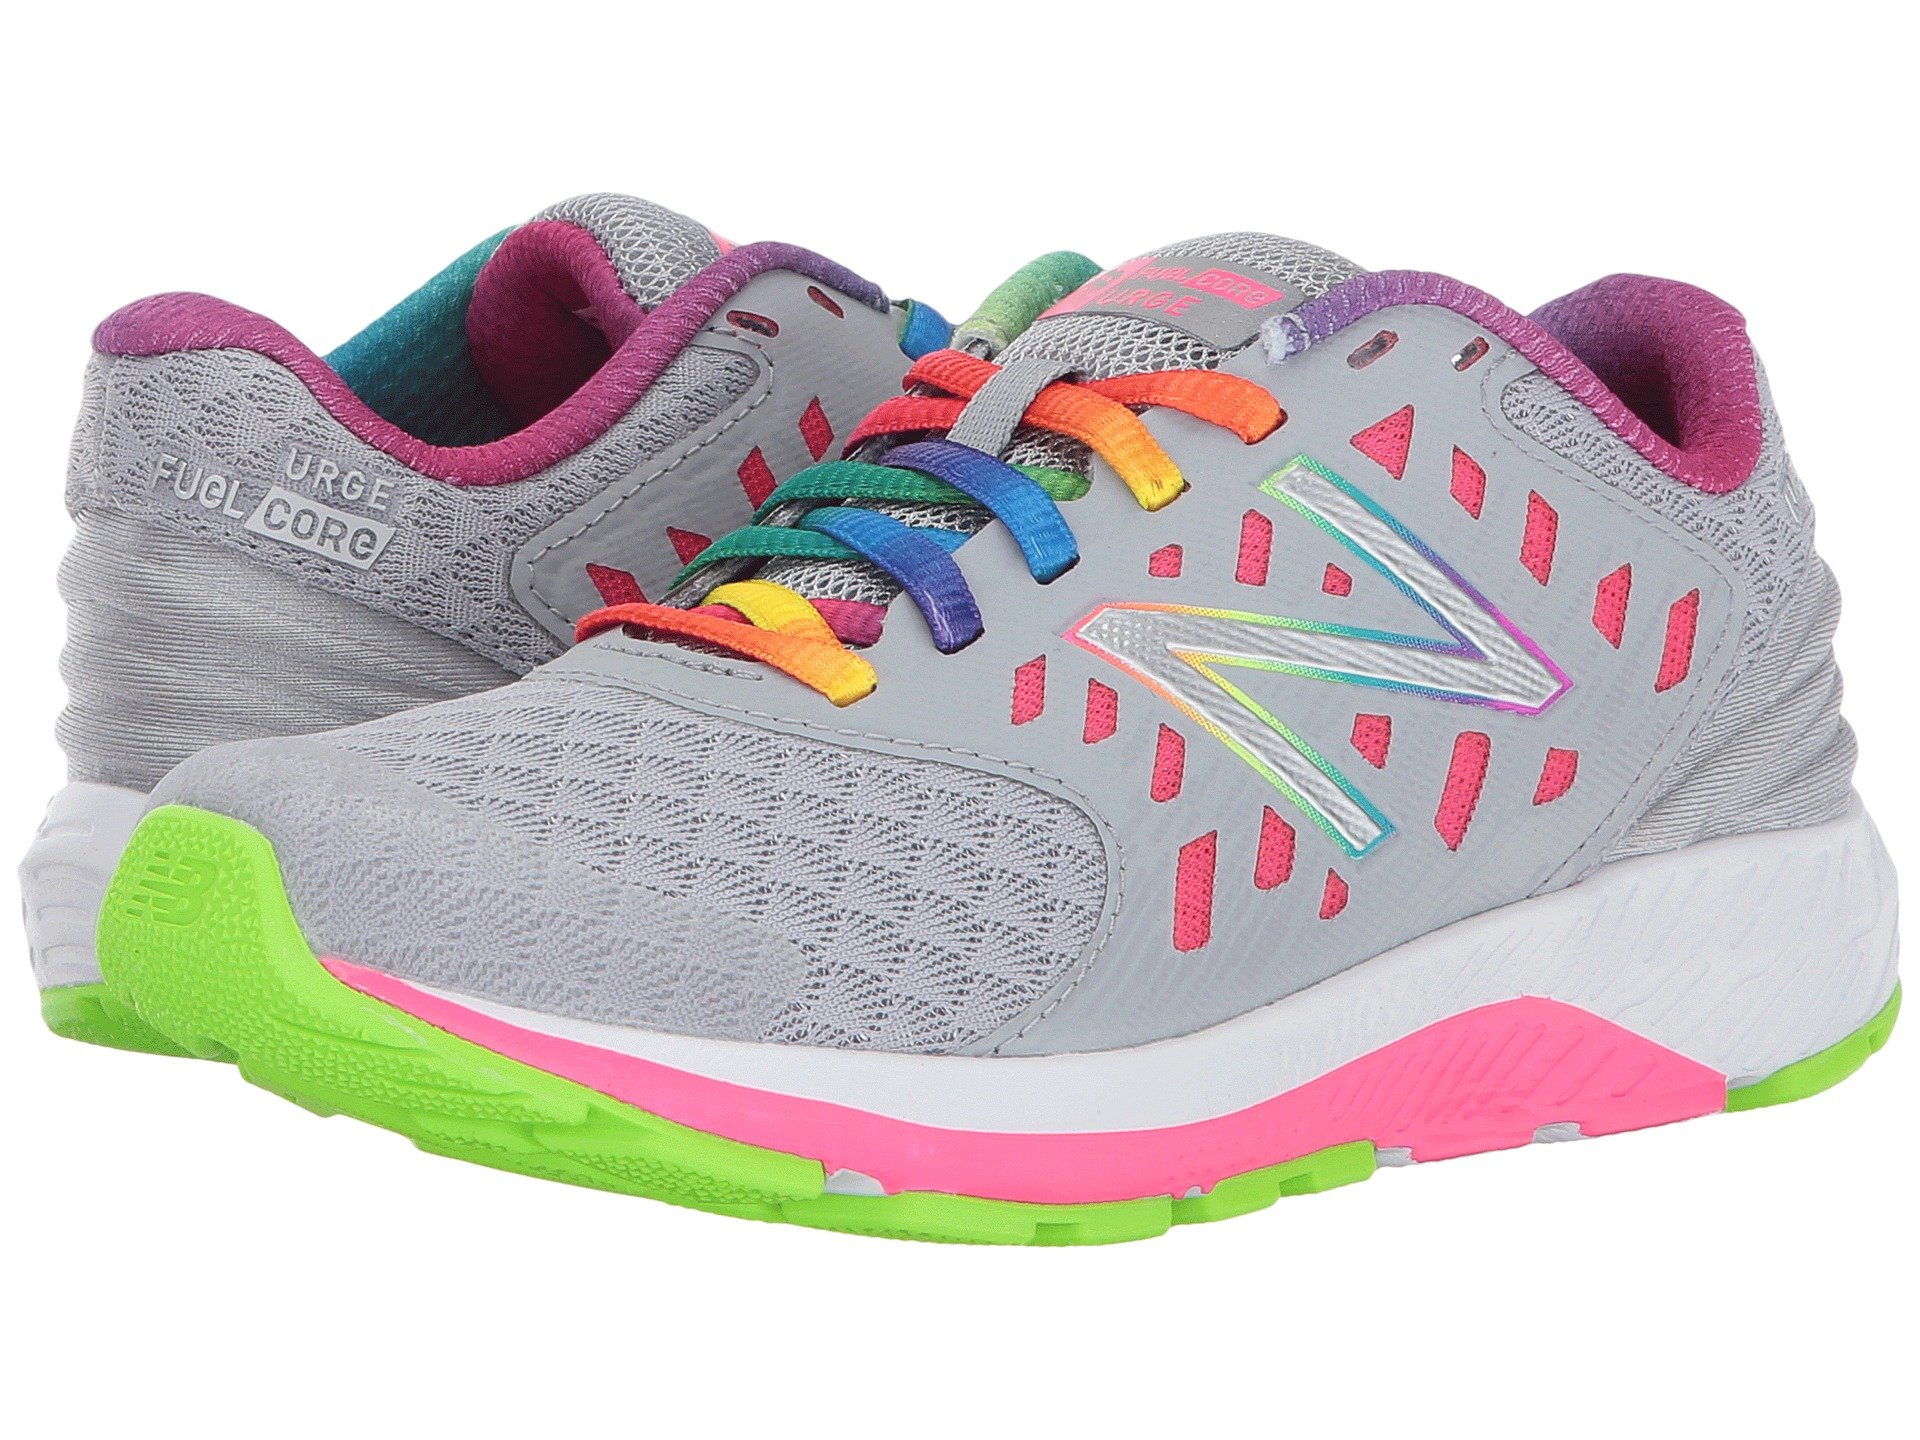 New Balance Girls' Urge V2 Road-Running-Shoes, Purple, 13 Extra Wide US Little Kid